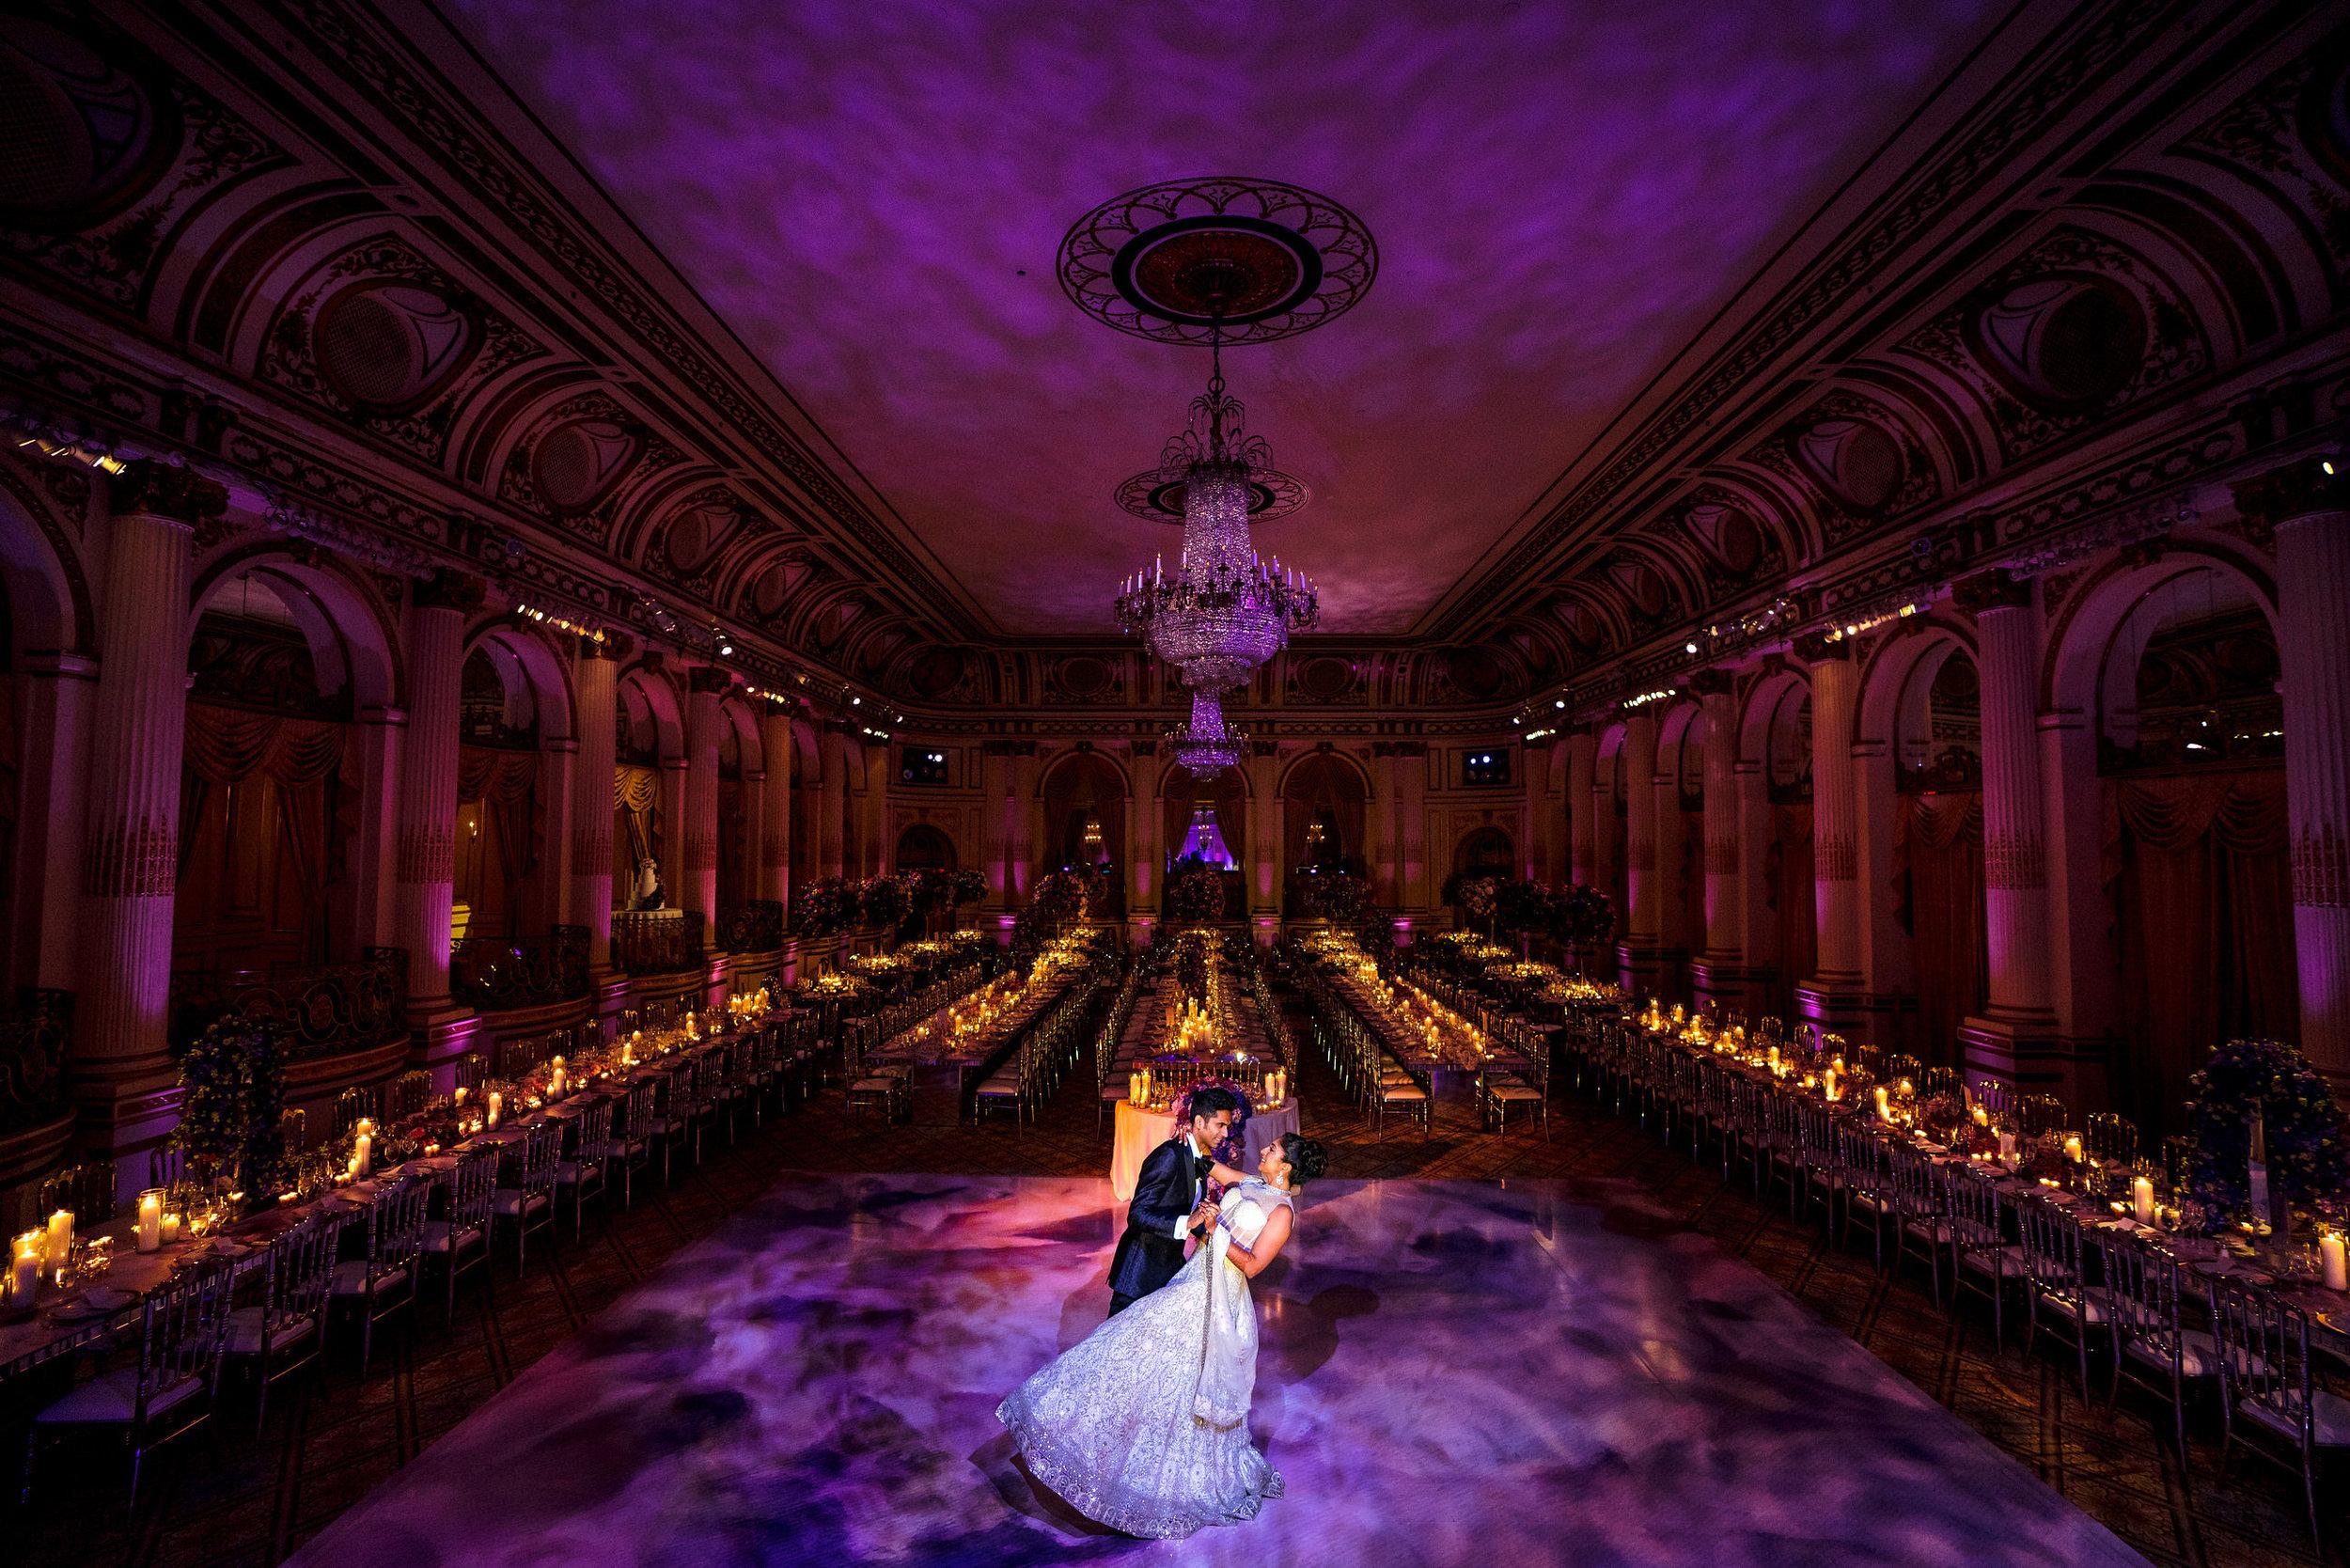 INDIAN WEDDING BRIDE AND GROOM DANCING SHOT.JPG